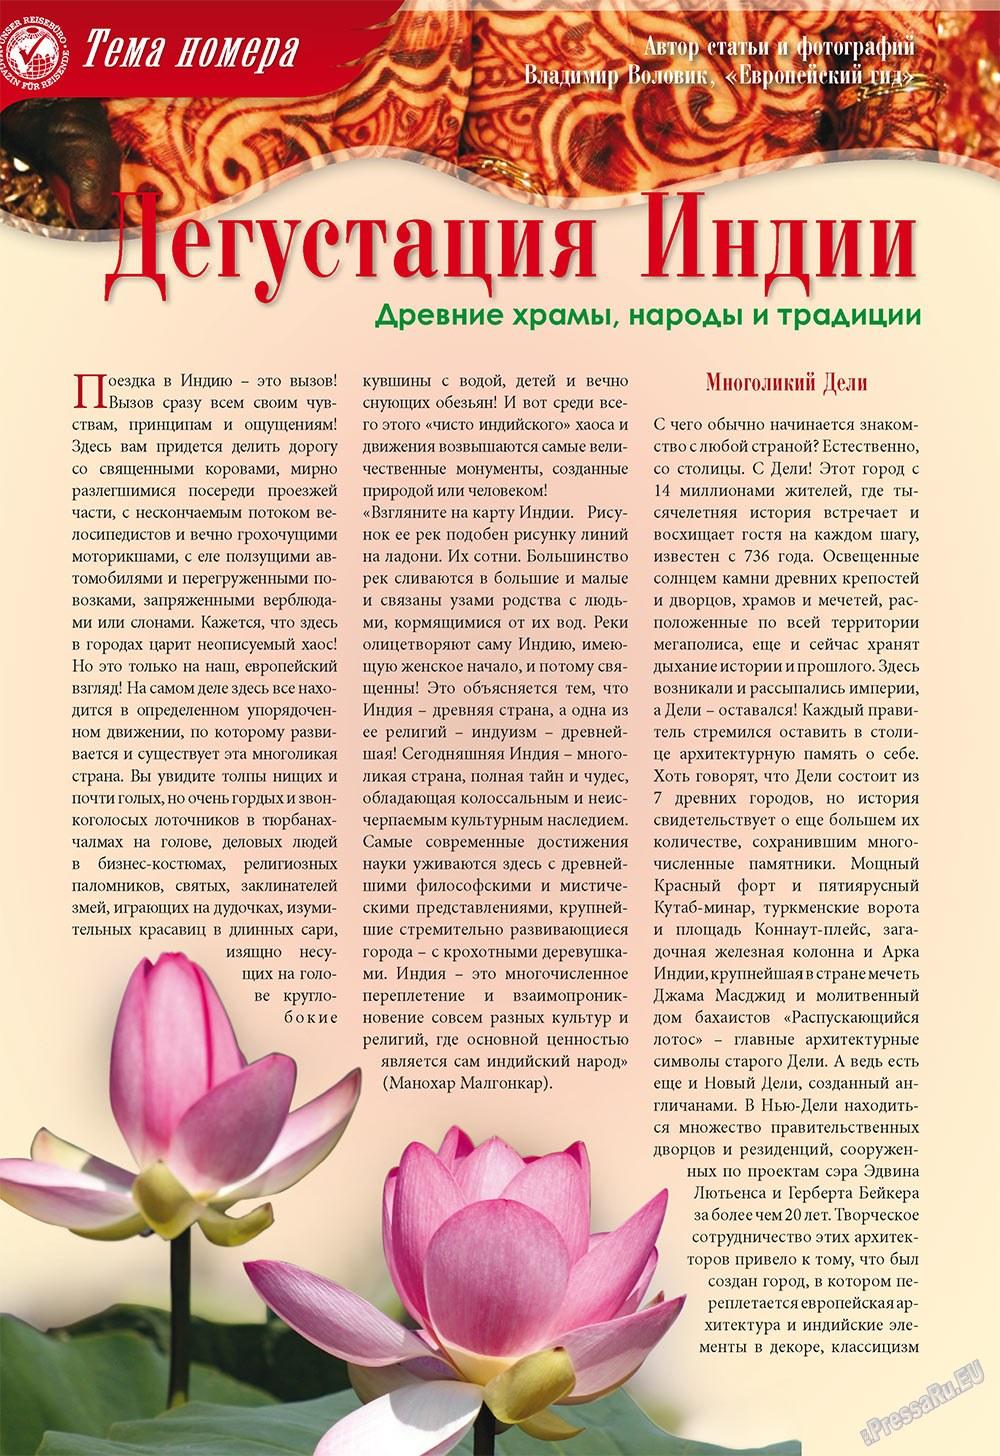 Наше Турбюро (журнал). 2010 год, номер 1, стр. 4